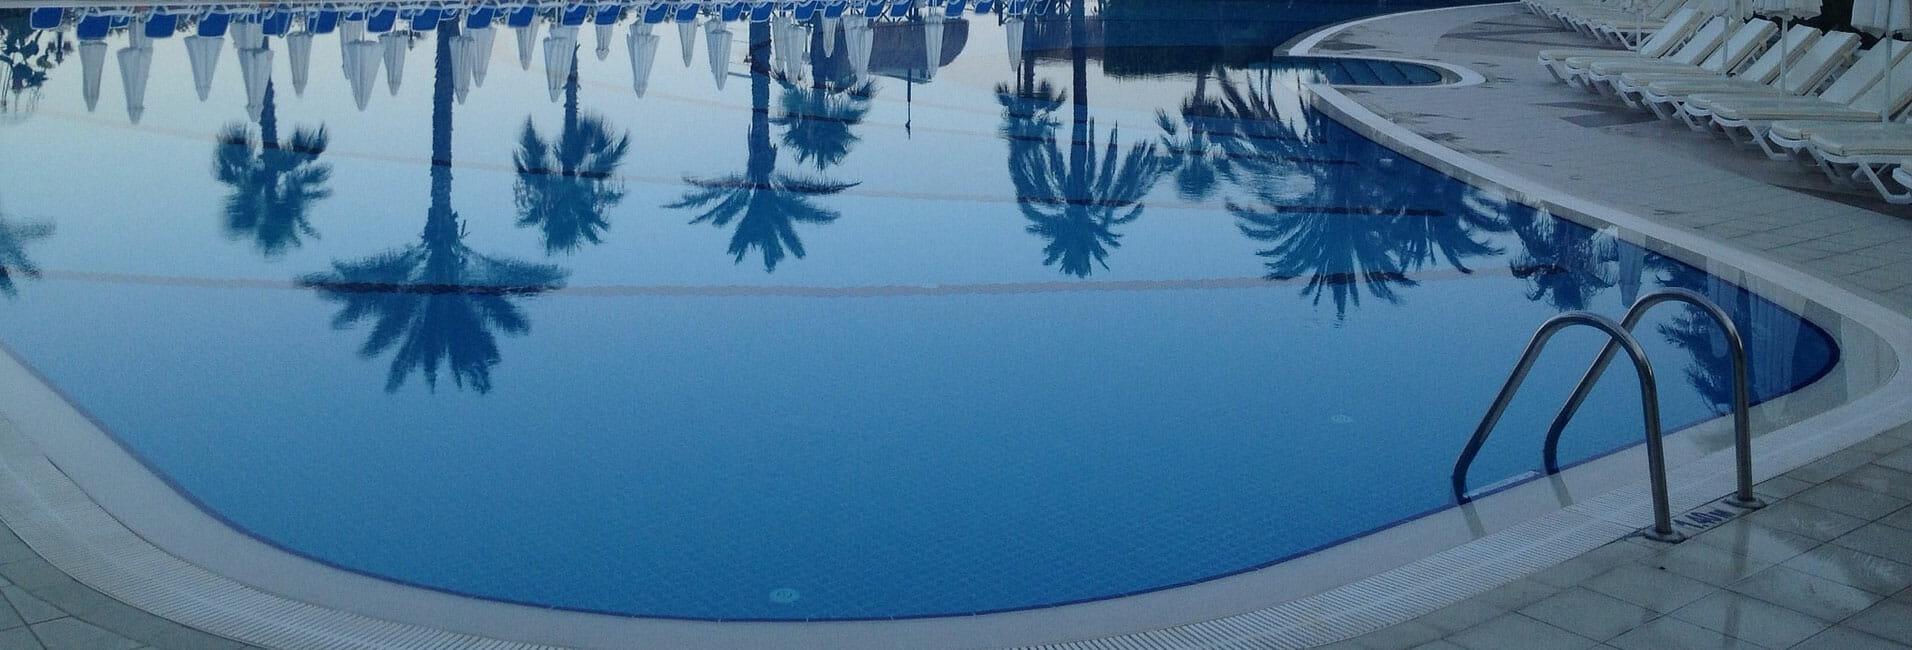 Prix piscine miroir coque designo pool le sur mesure au for Piscine miroir prix